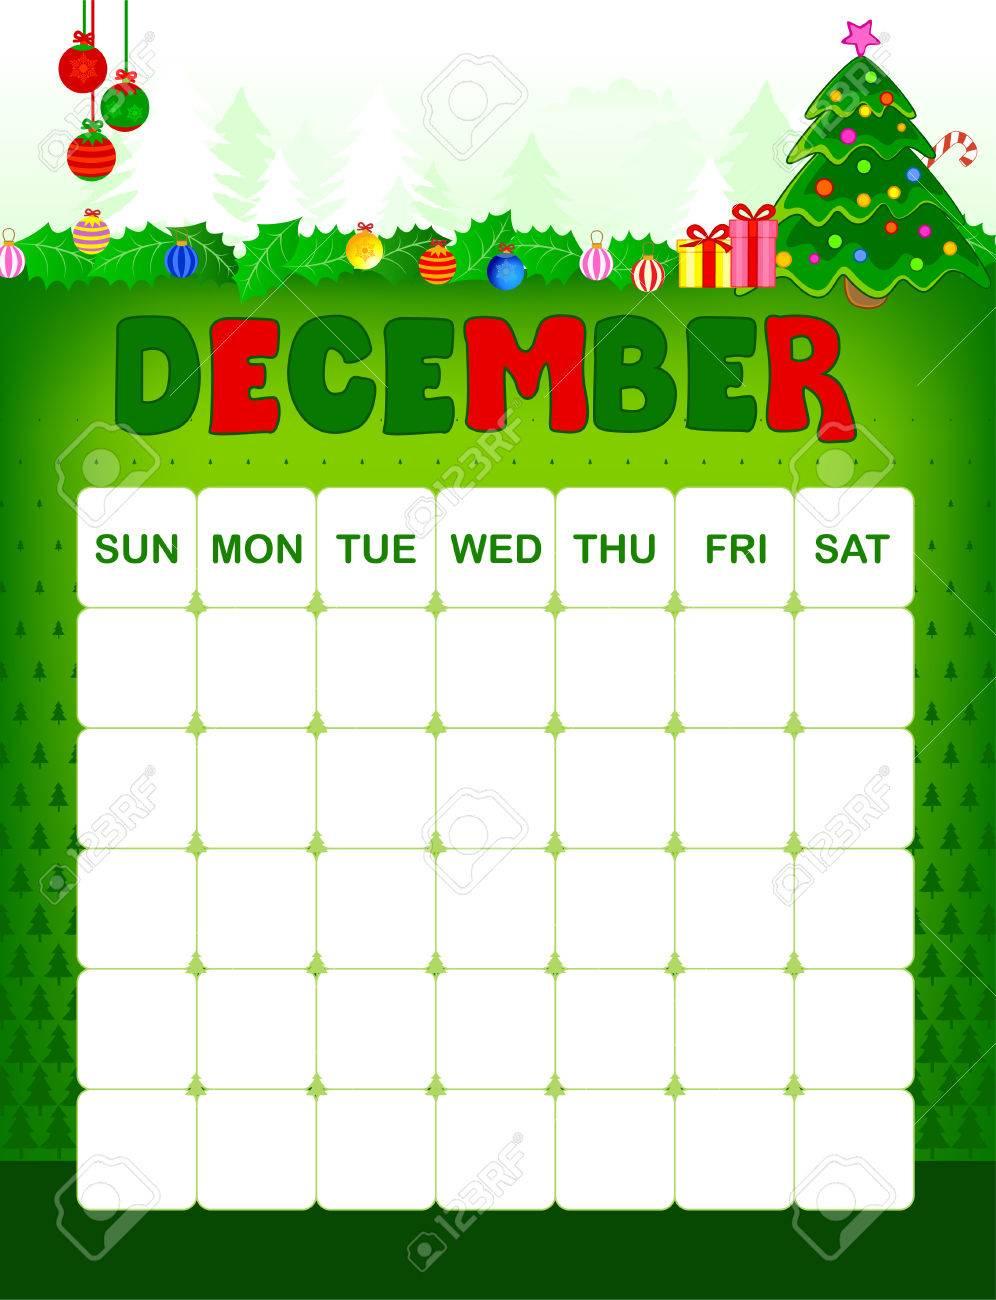 Colorful Wall Calendar Page Template With Seasonal Graphics For.. regarding Christmas Themed Calendar Templates